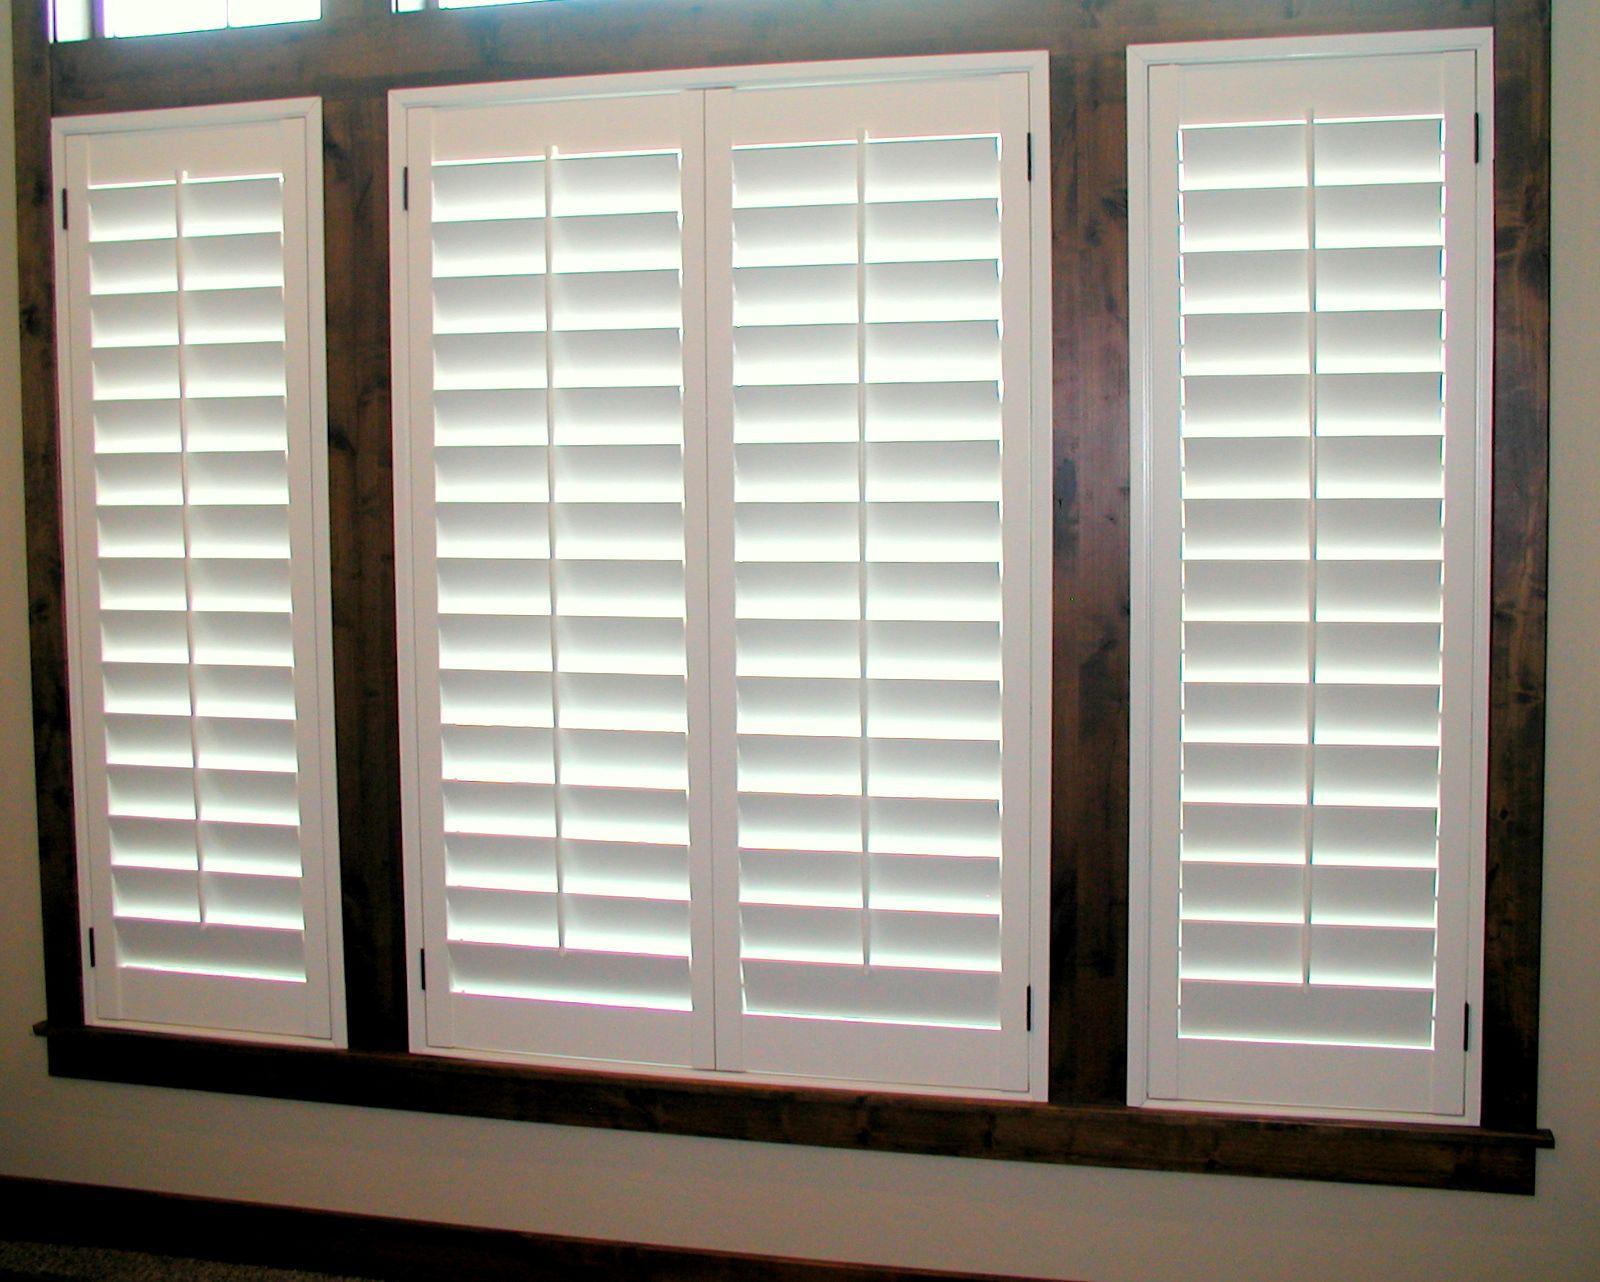 Wood Shutters Paint Stain Combo Stanfieldshutter Com Buy Interior Doors Interior Shutters Window Treatments Living Room